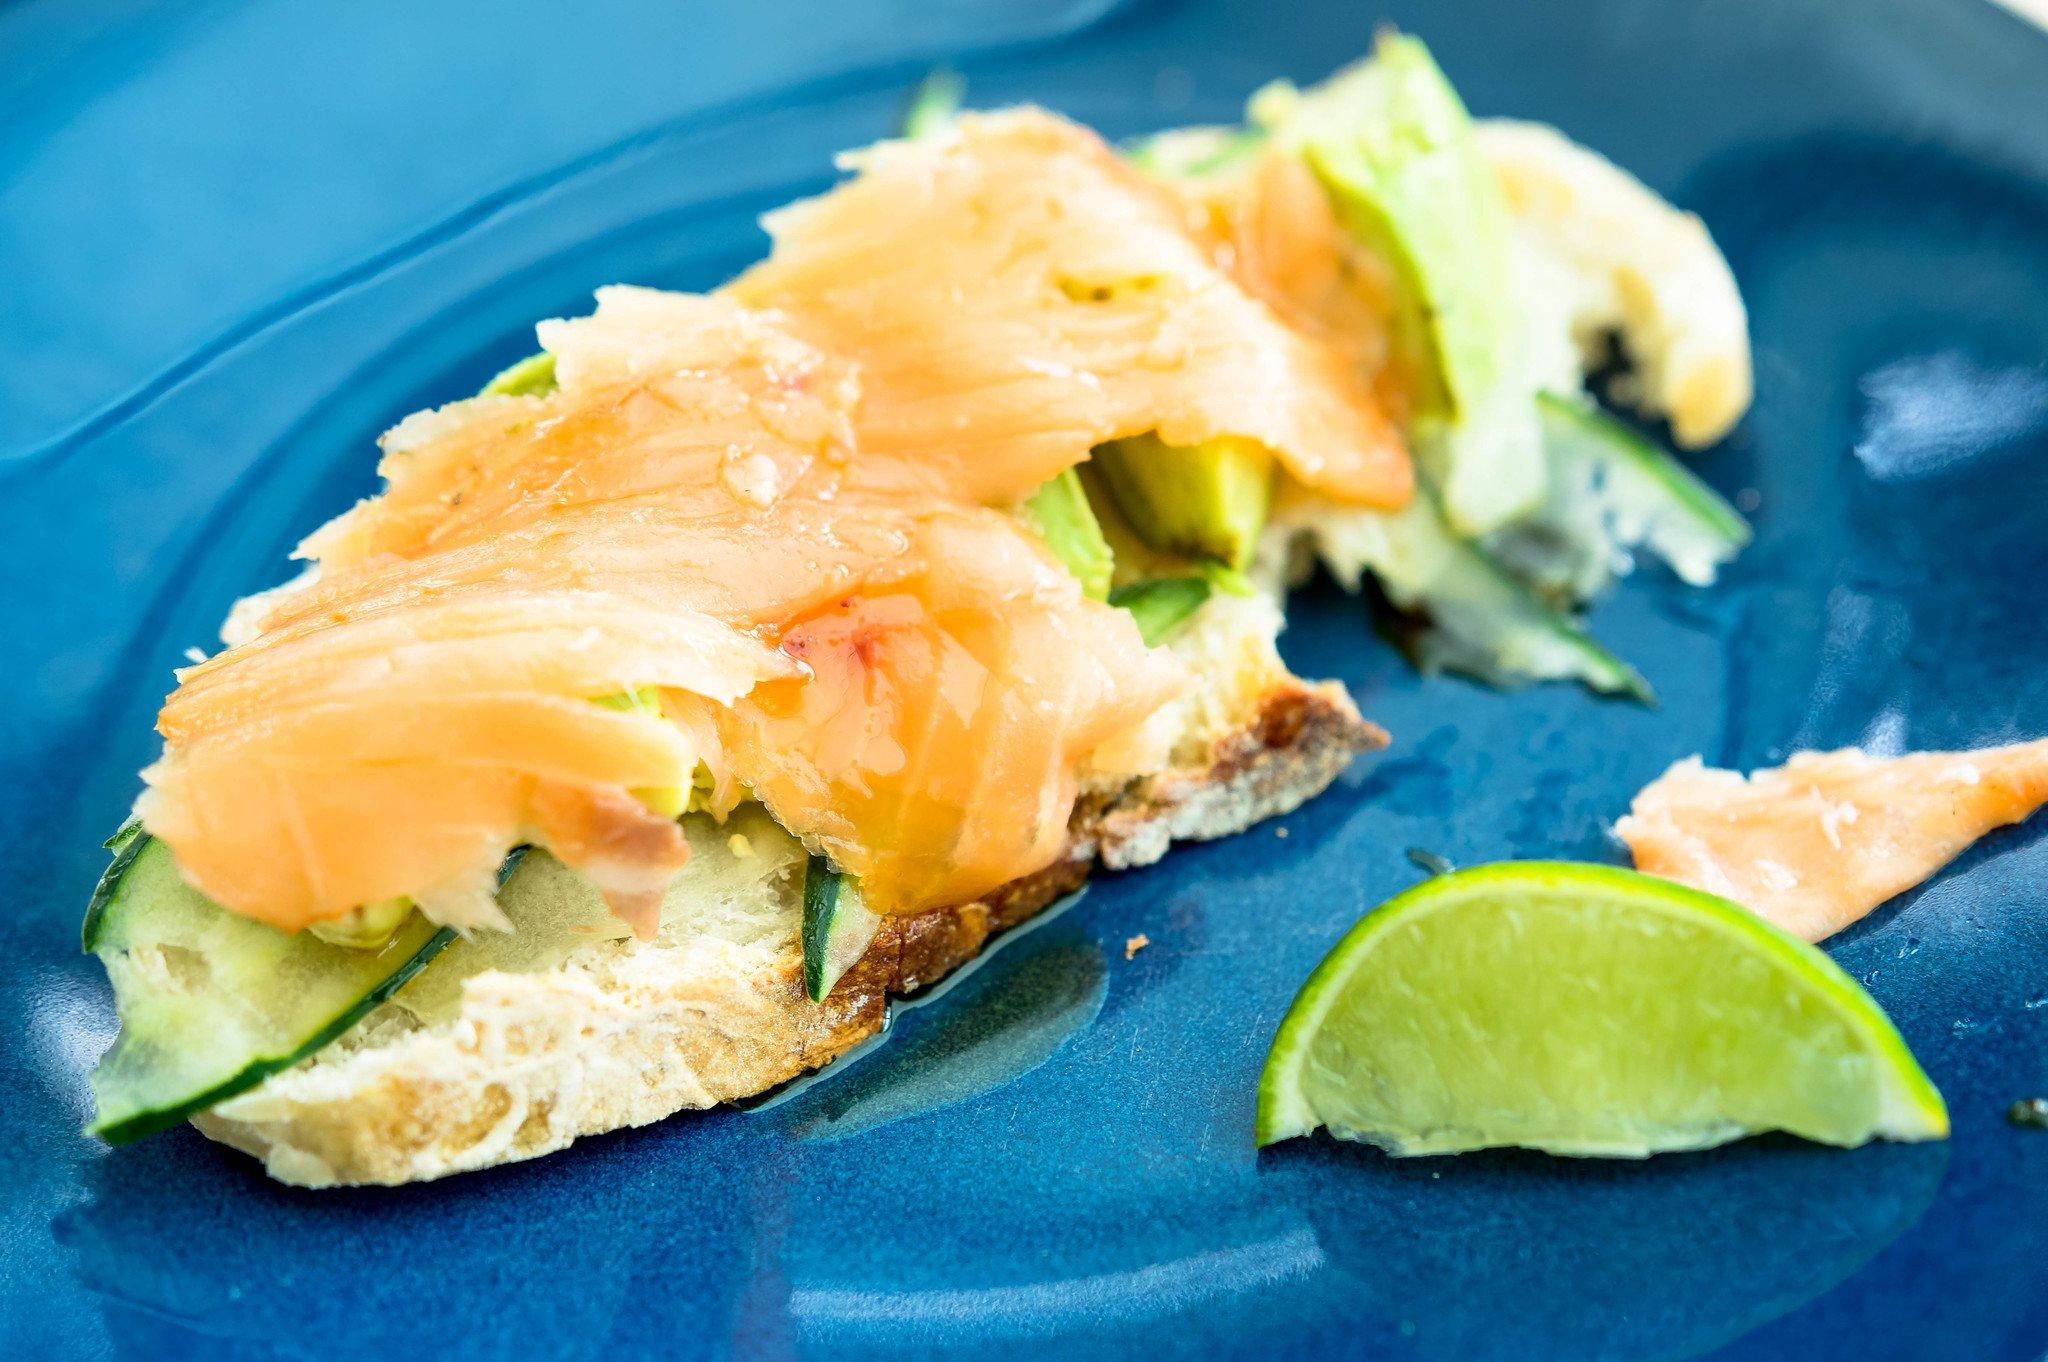 tostada aguacate y salmon calorias